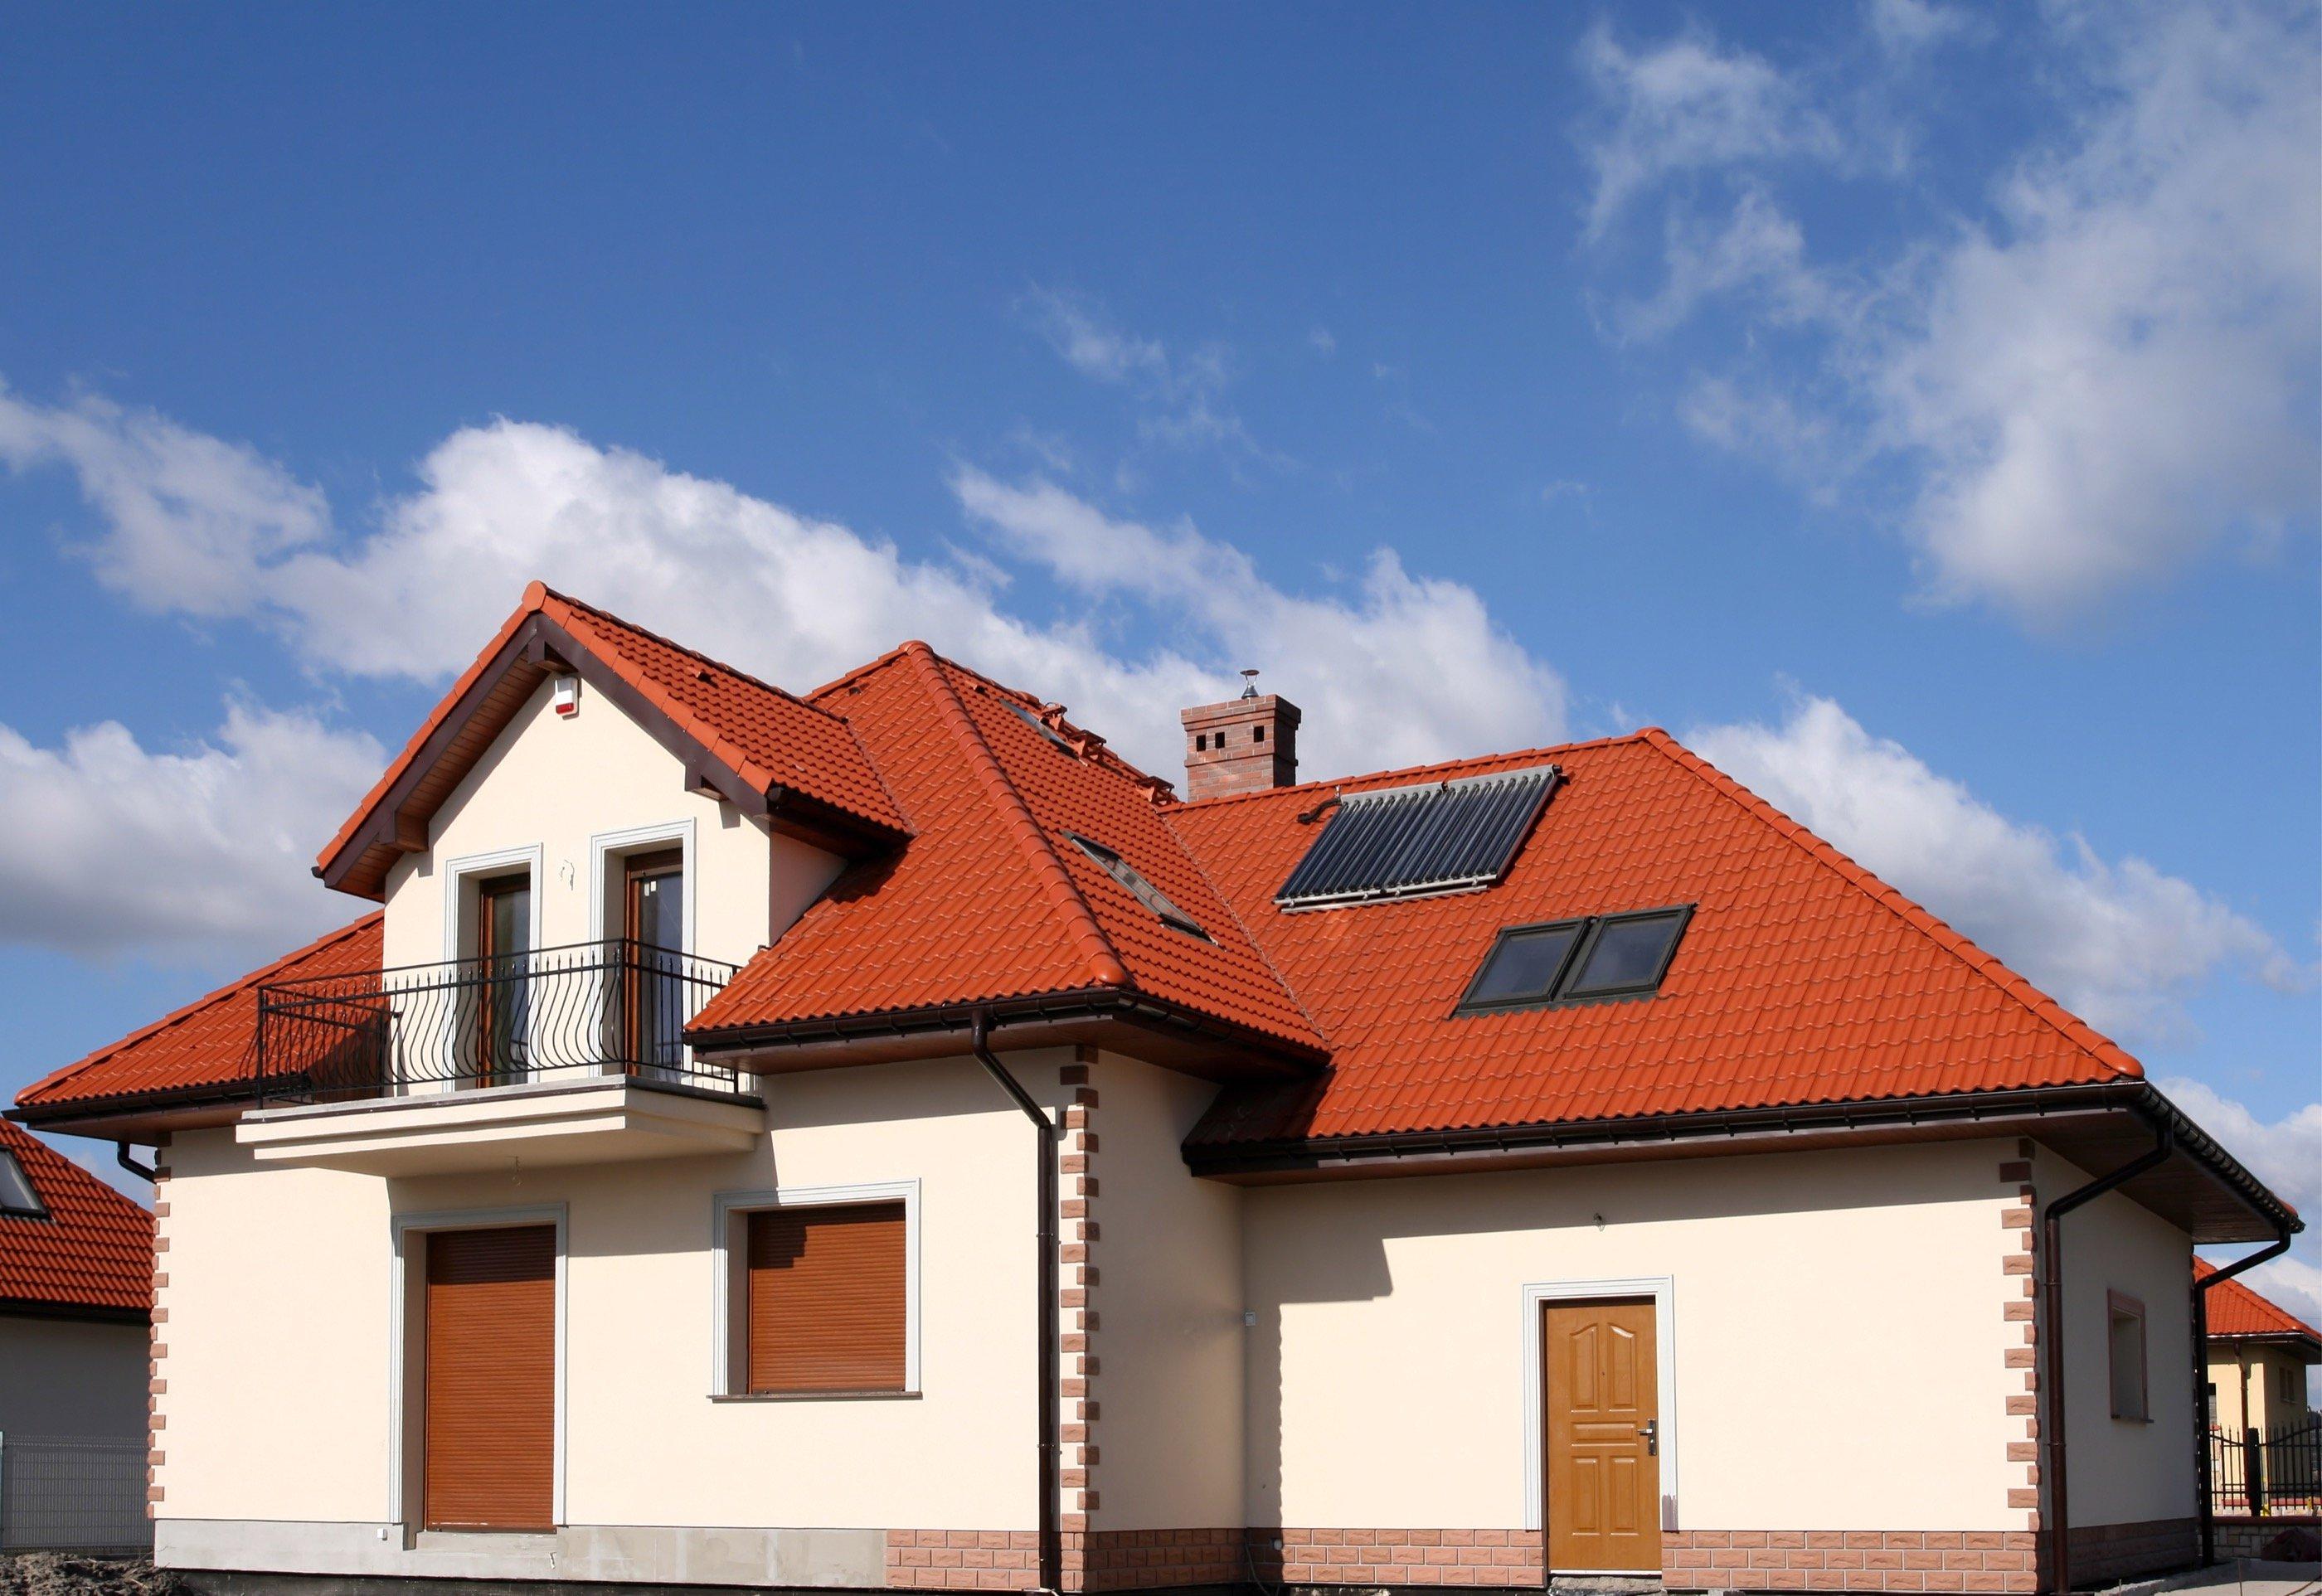 Roofing Contractor Jacksonville, FL